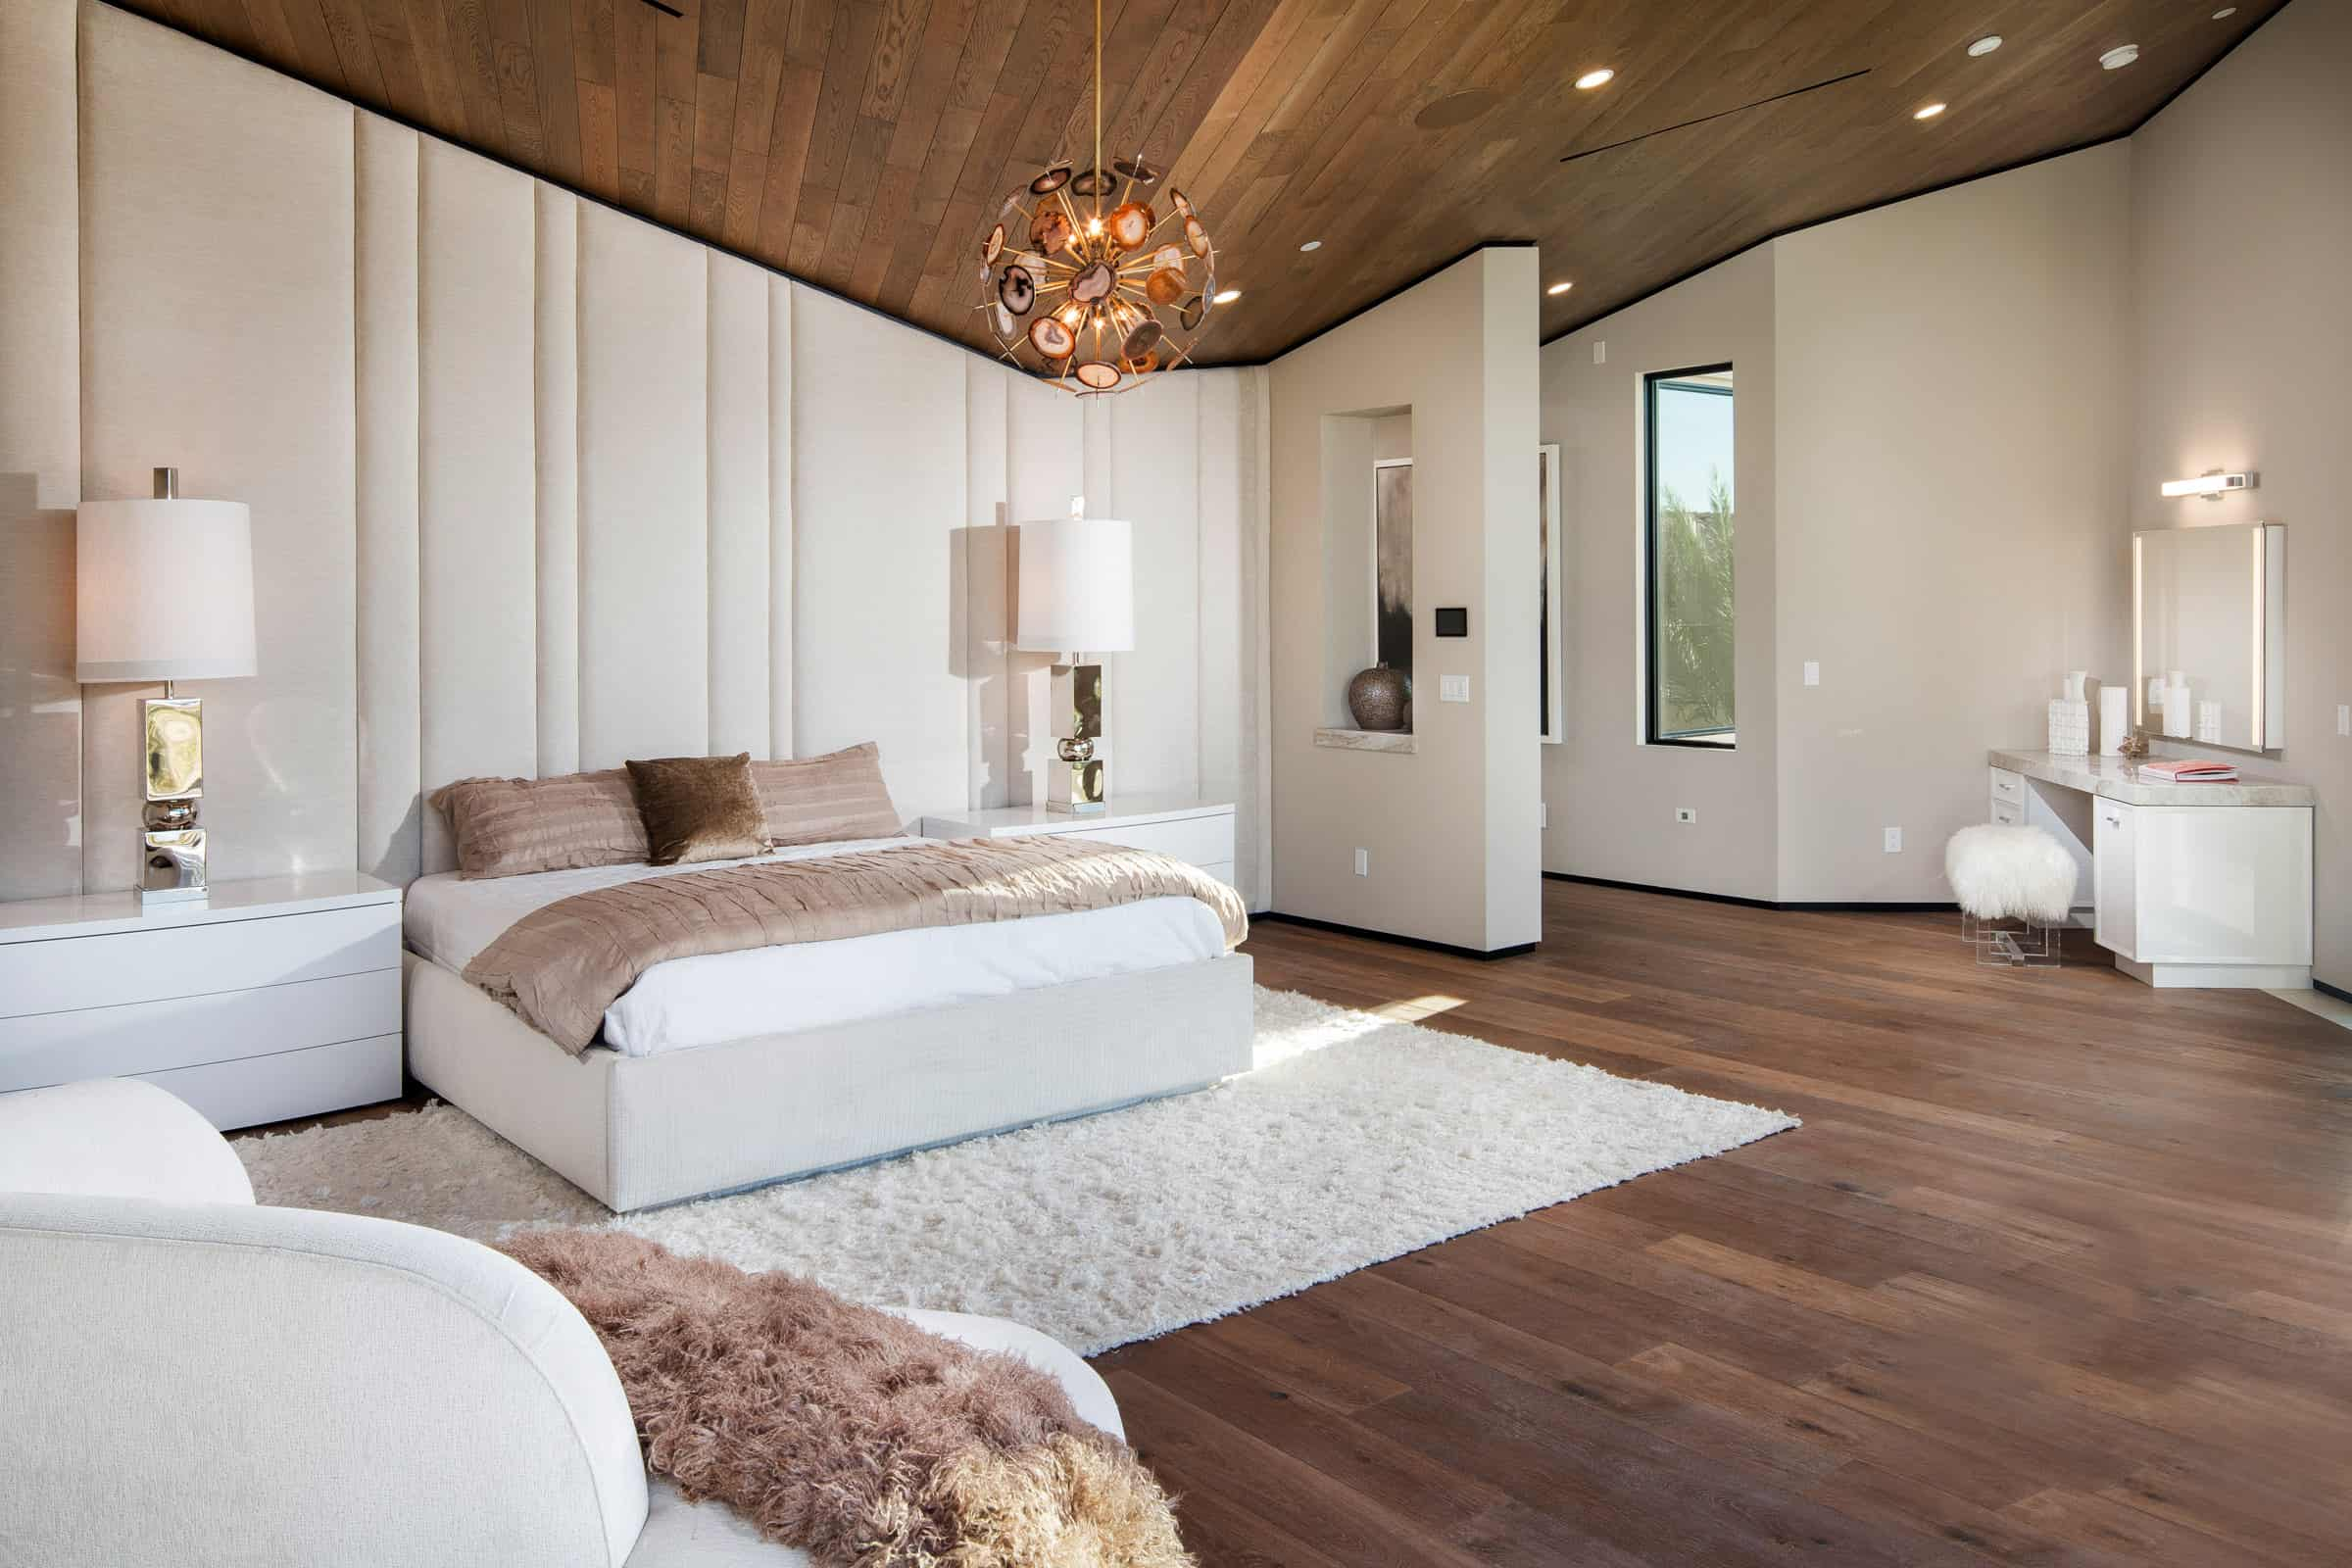 6 Tips how to improve your Interior Design Photos